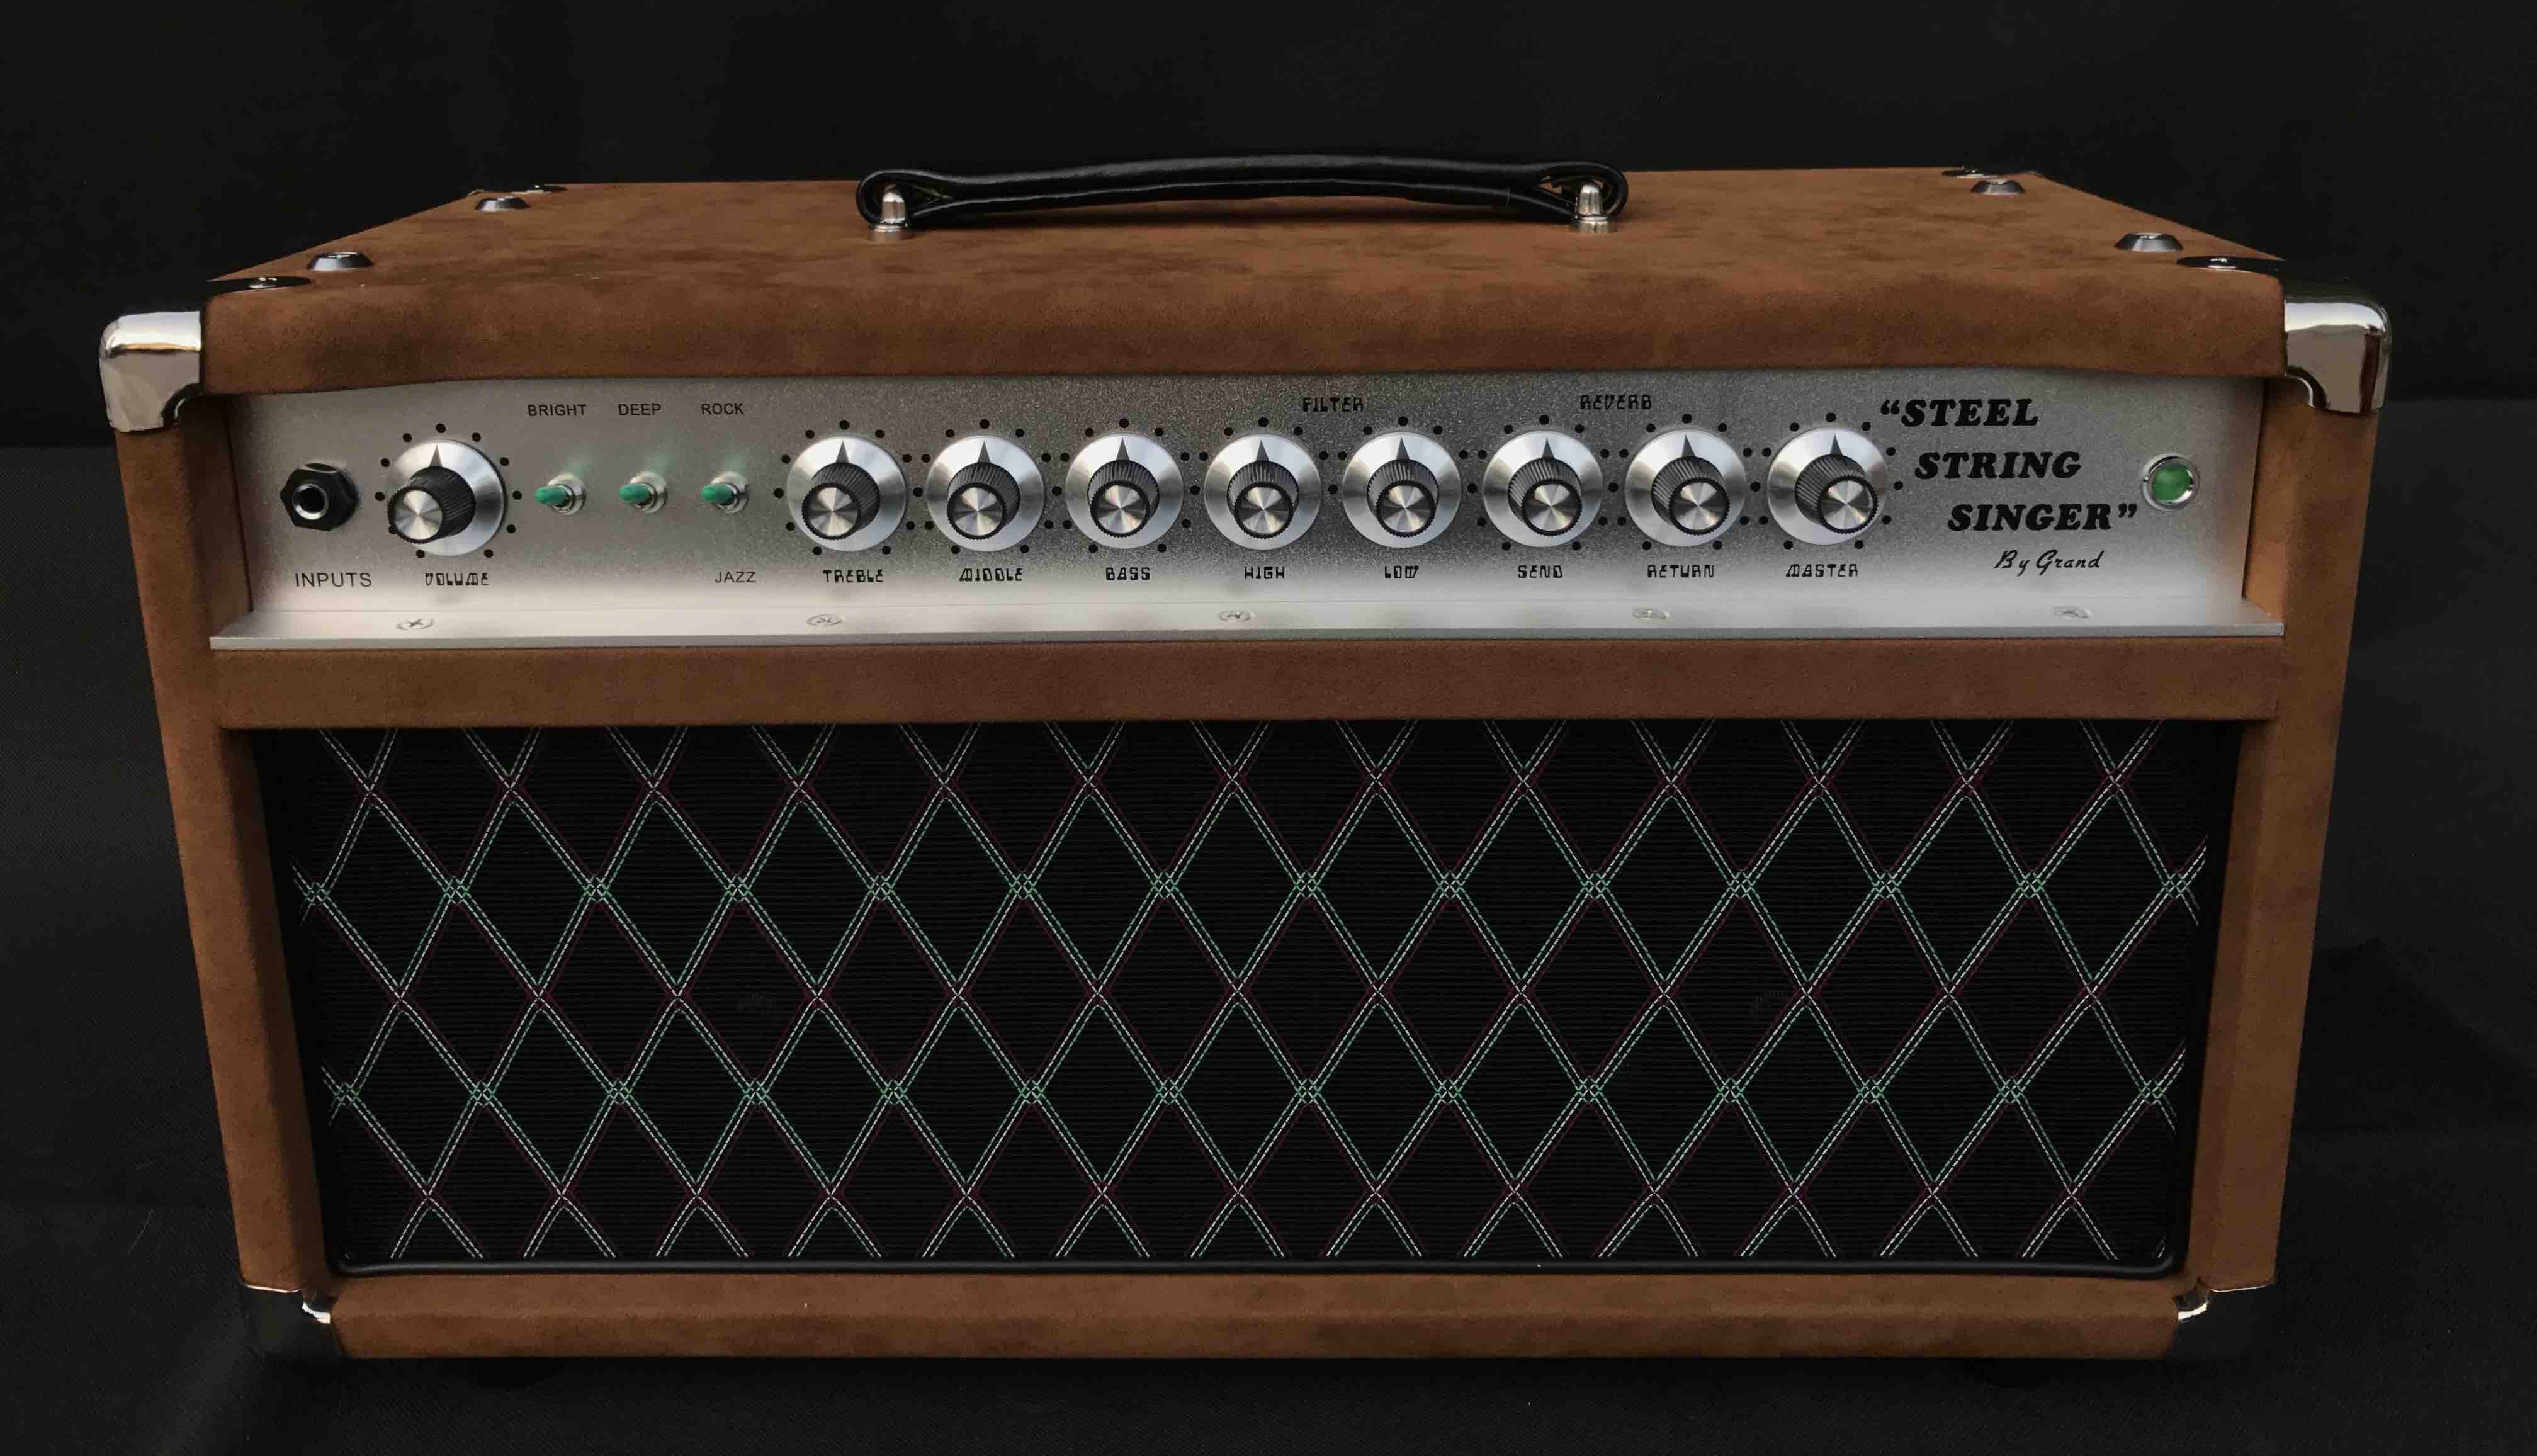 Professional Tube Guitar AMP Head 100W Dumble Tone SSS Steel String Singer Valve Amplifier in Brown